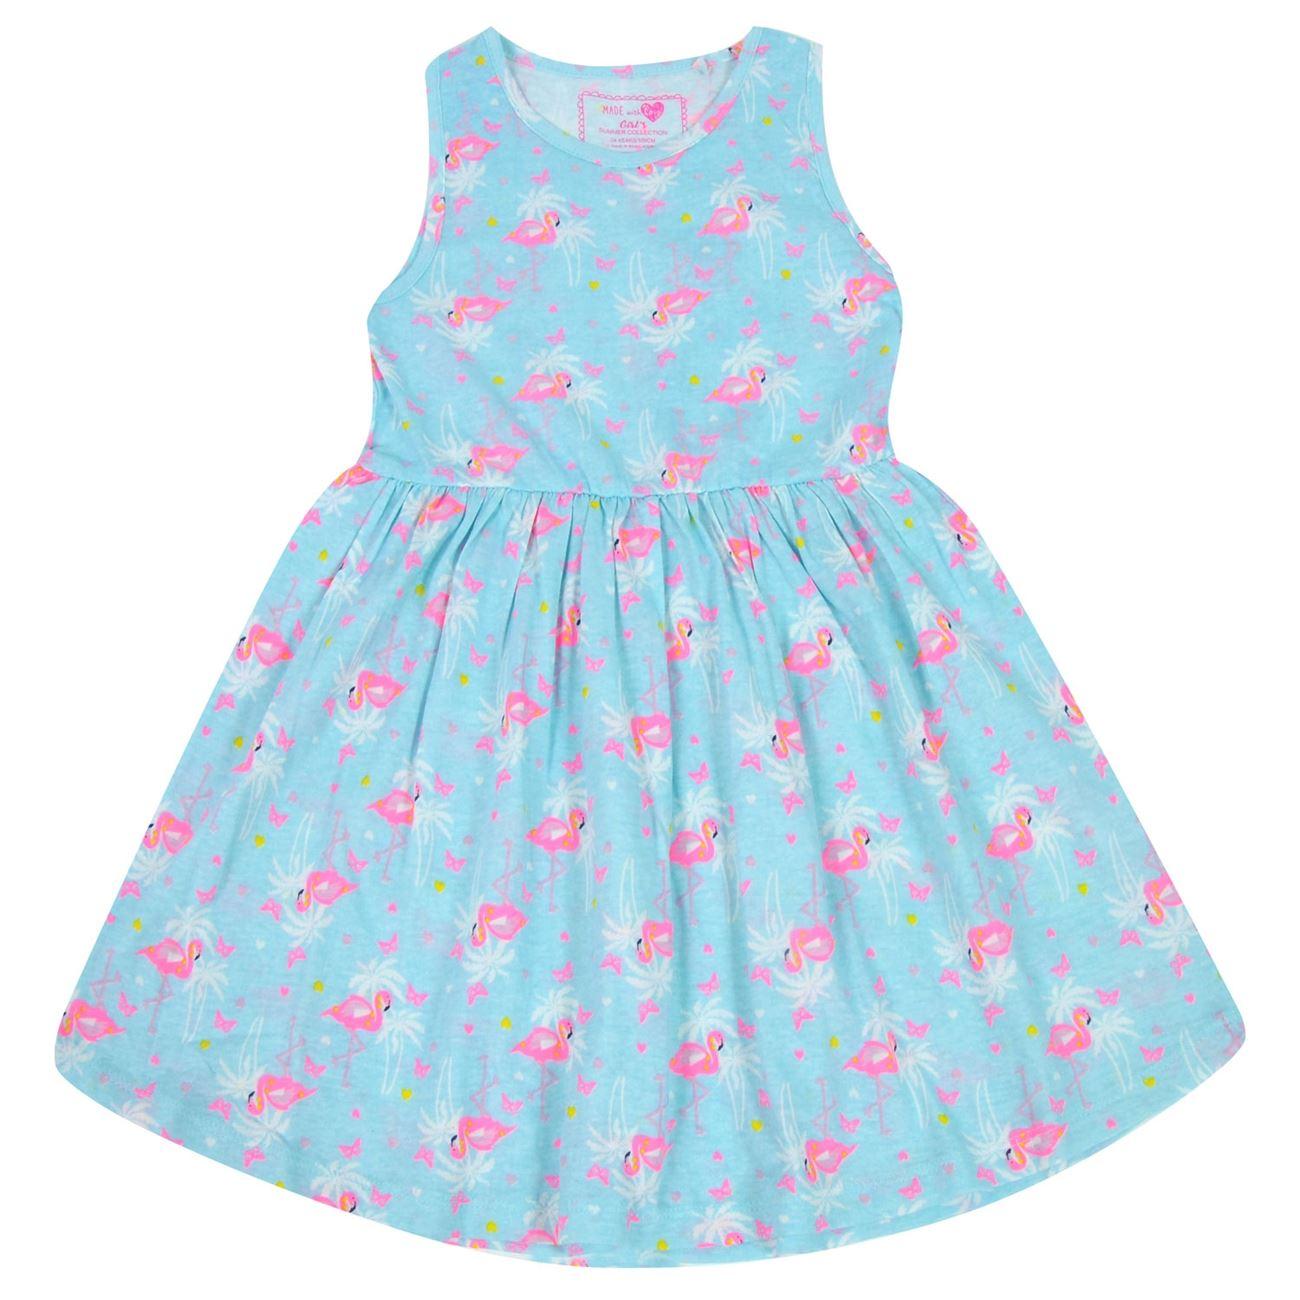 a9b8b9c8b7a0 Φόρεμα Αμάνικο Παιδικό Σιέλ Φλαμίνγκο < Φορέματα για Κορίτσια | Jumbo